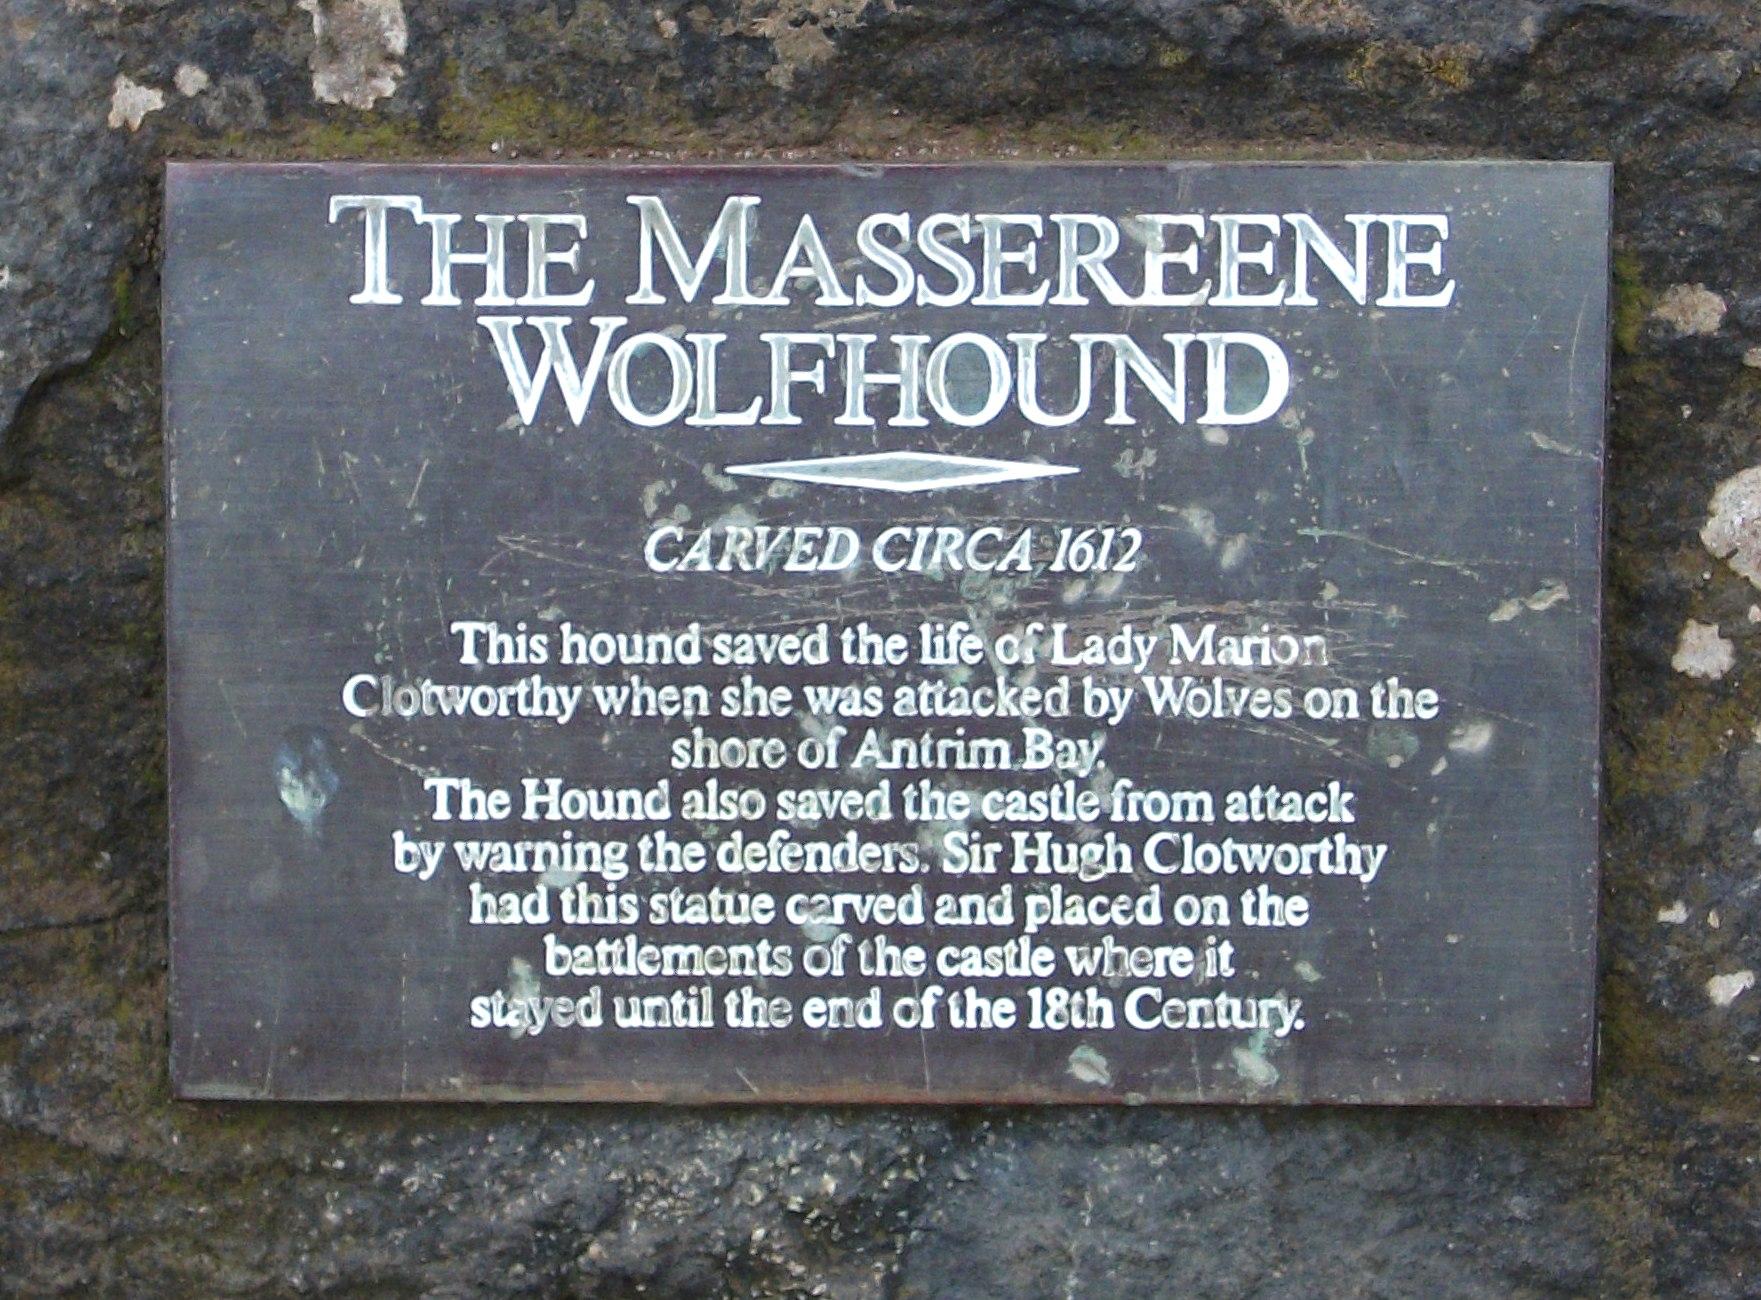 irish wolfhound wolf mix displaying 20 images for irish wolfhound wolf